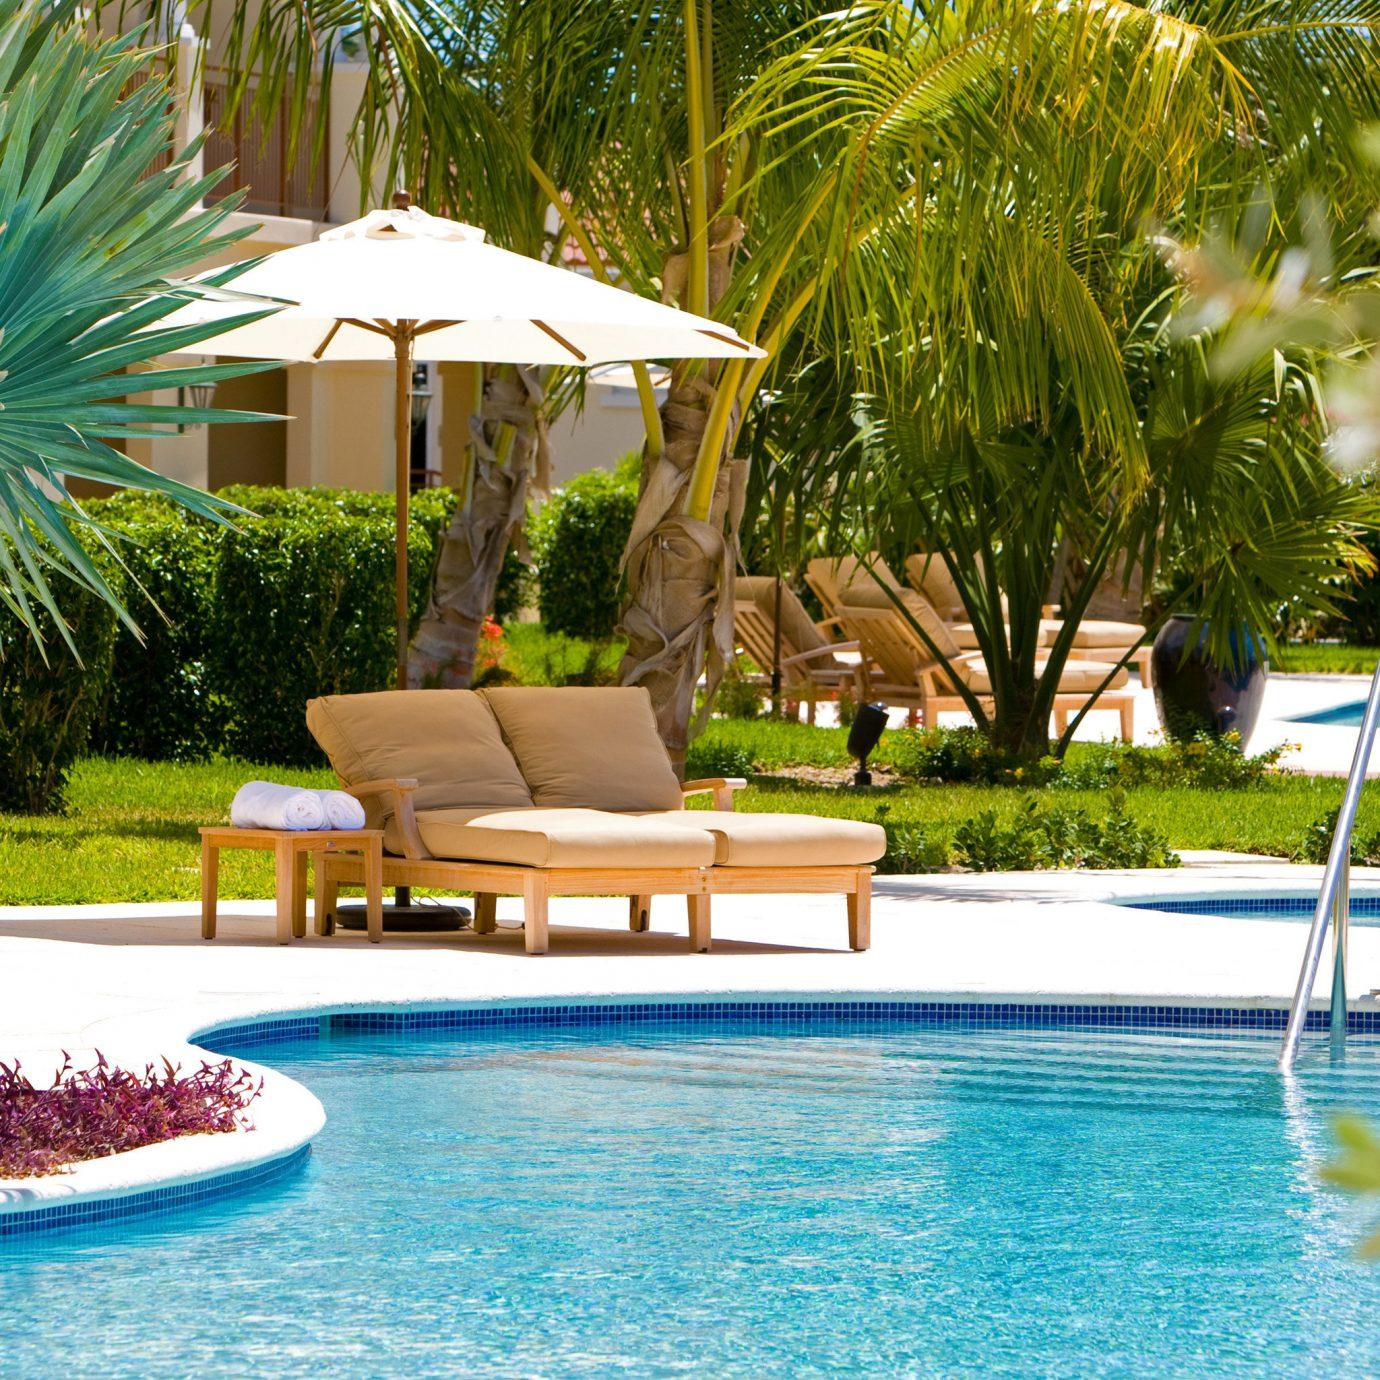 Beachfront Grounds Play Pool tree Resort swimming pool leisure property backyard Villa home condominium swimming palm